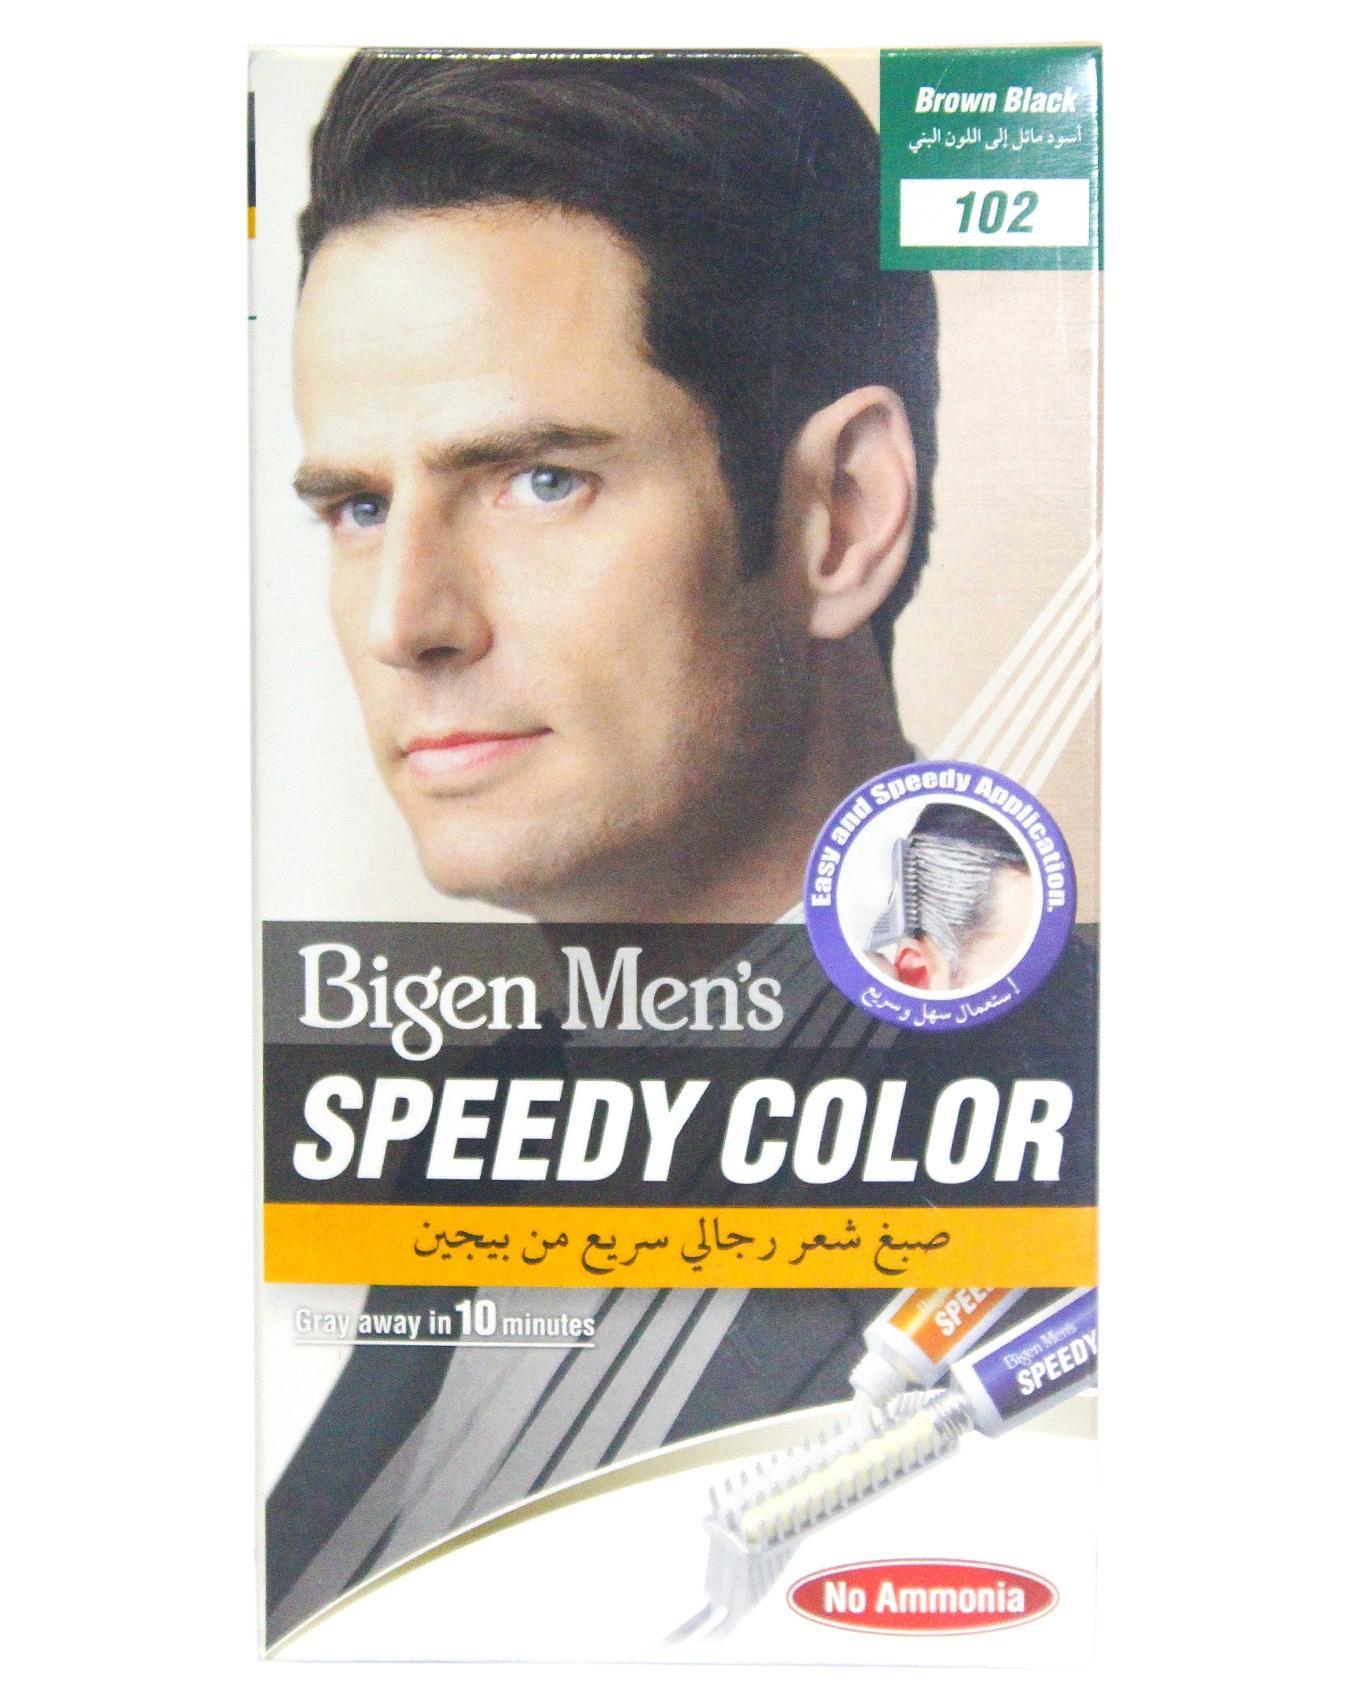 Buy capricorn,Bigen,biocos Hair Coloring at Best Prices